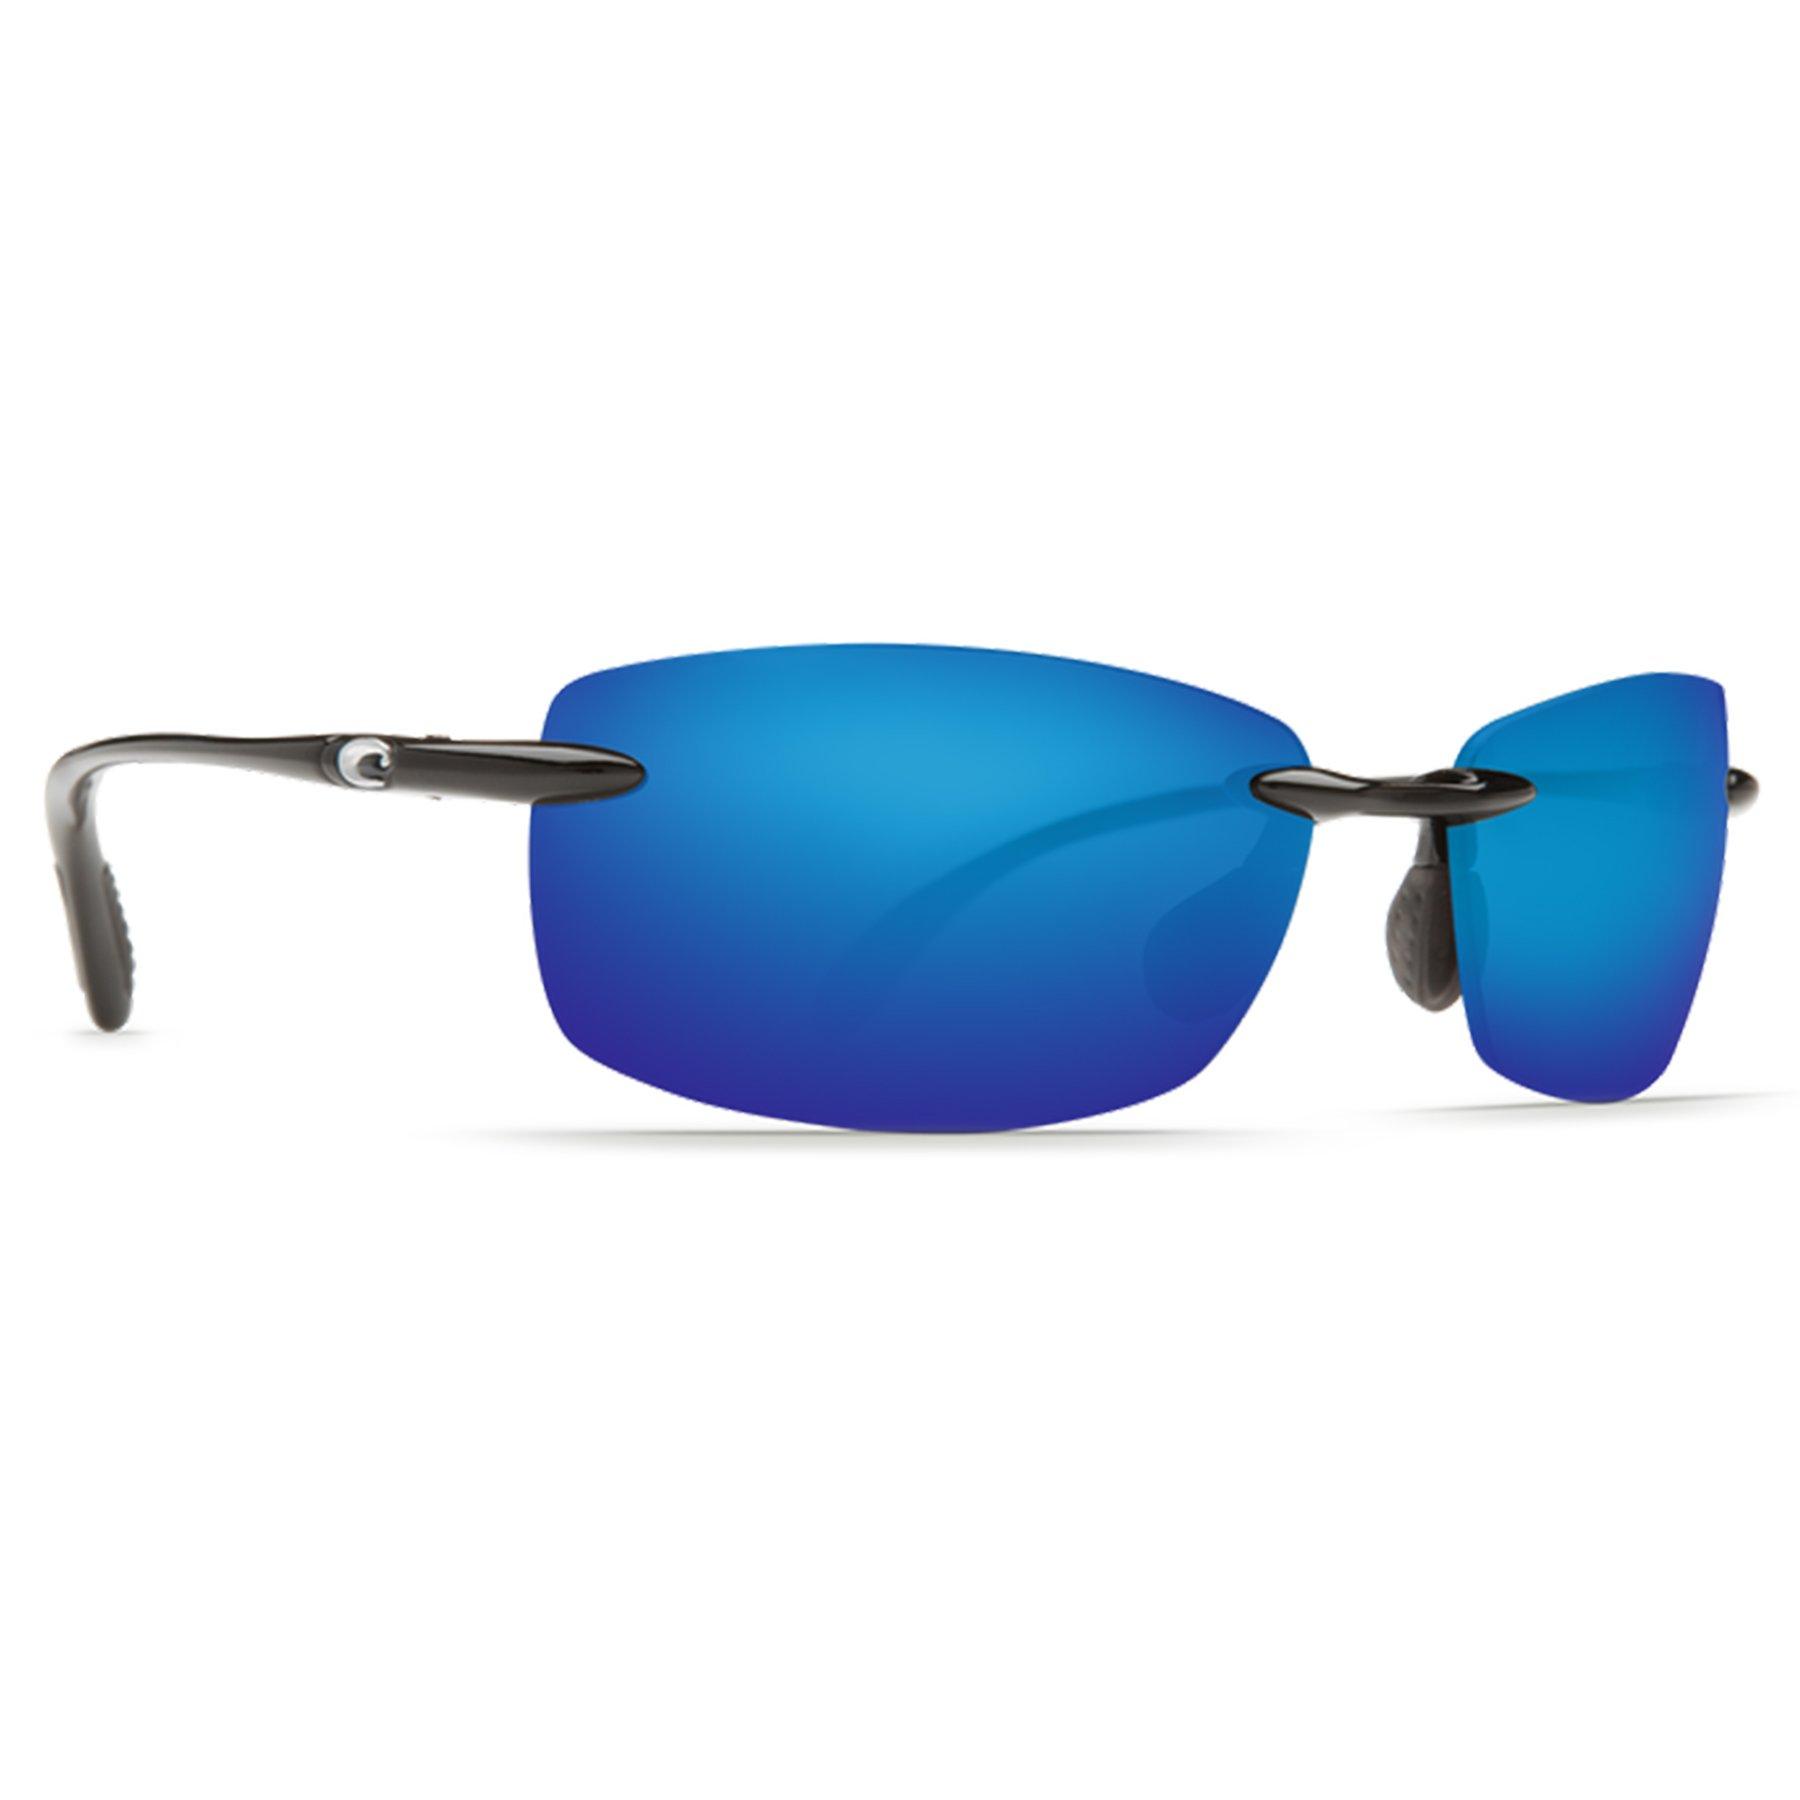 Costa del Mar BA 11 OBMP 59.6 mm Unisex-Adult Ballast Polarized Iridium Rimless Sunglasses, Black/Blue Mirror 580 Plastic Lens